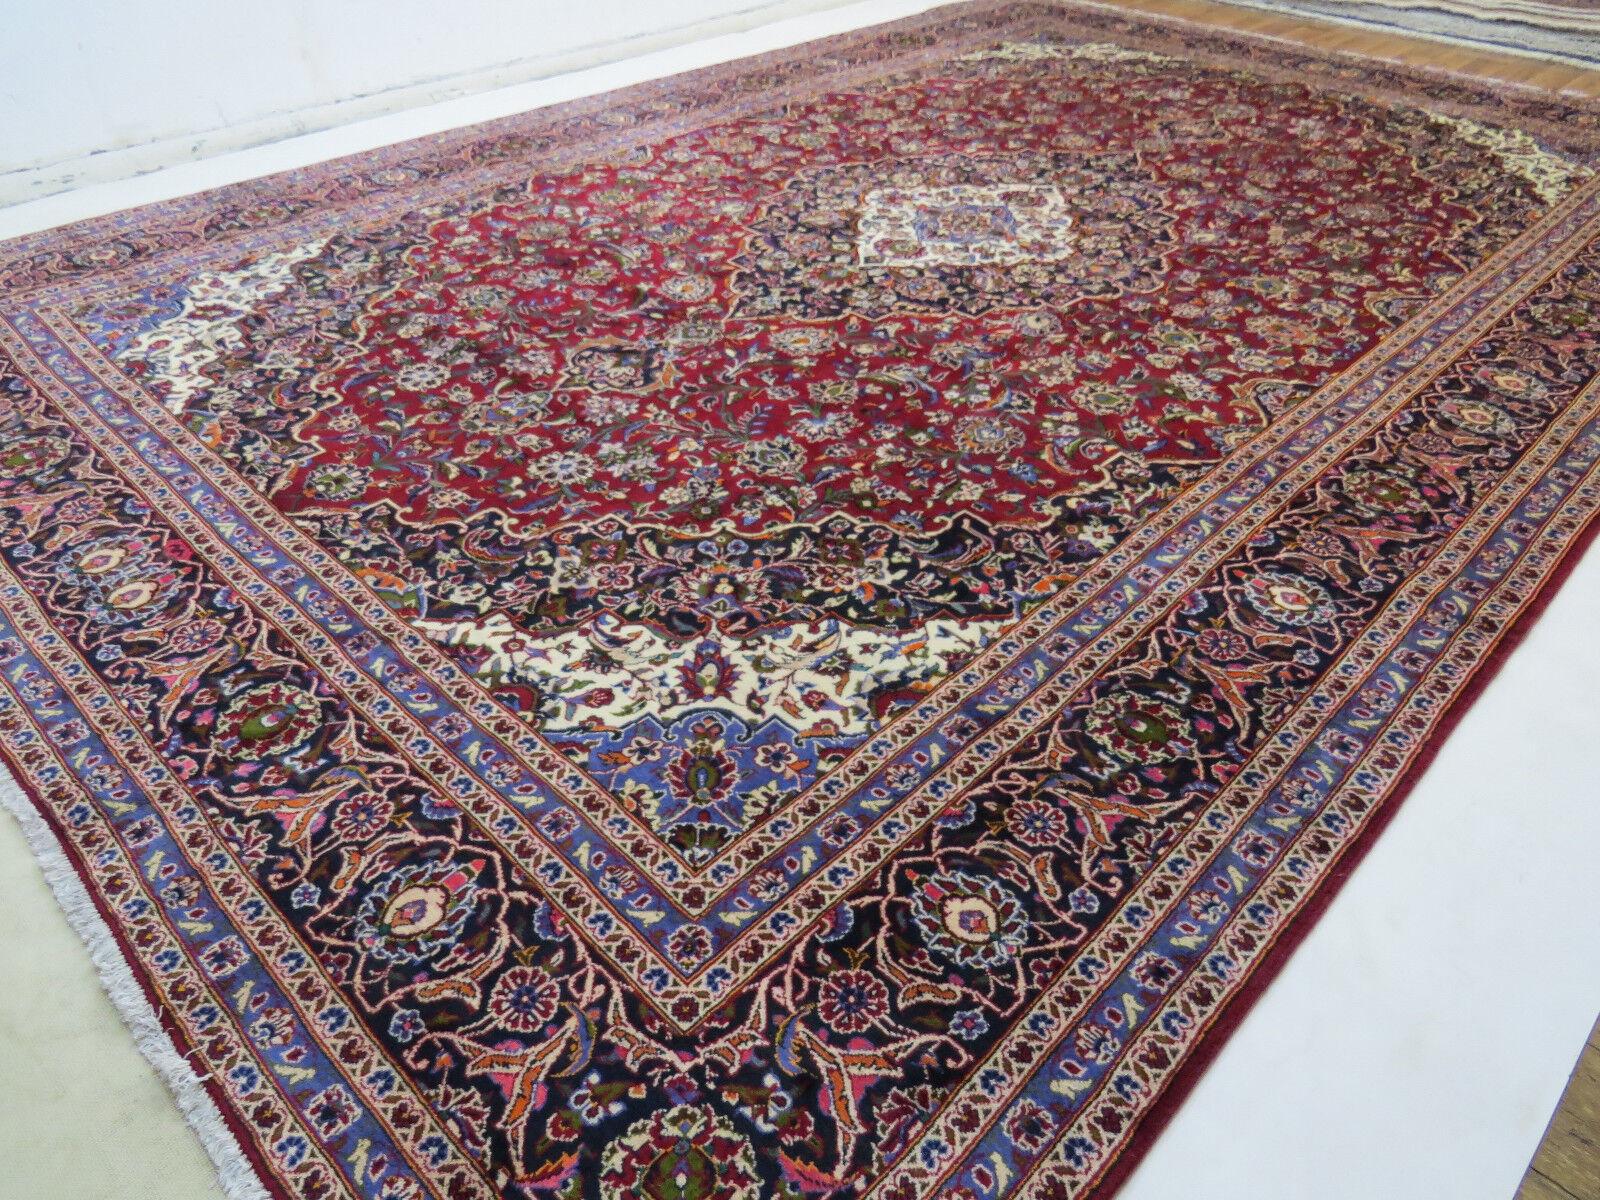 Superbe Beau Tapis oriental Nº 510x343 persan TOP NEUF Nº oriental 6278 Kashan 5e49ee